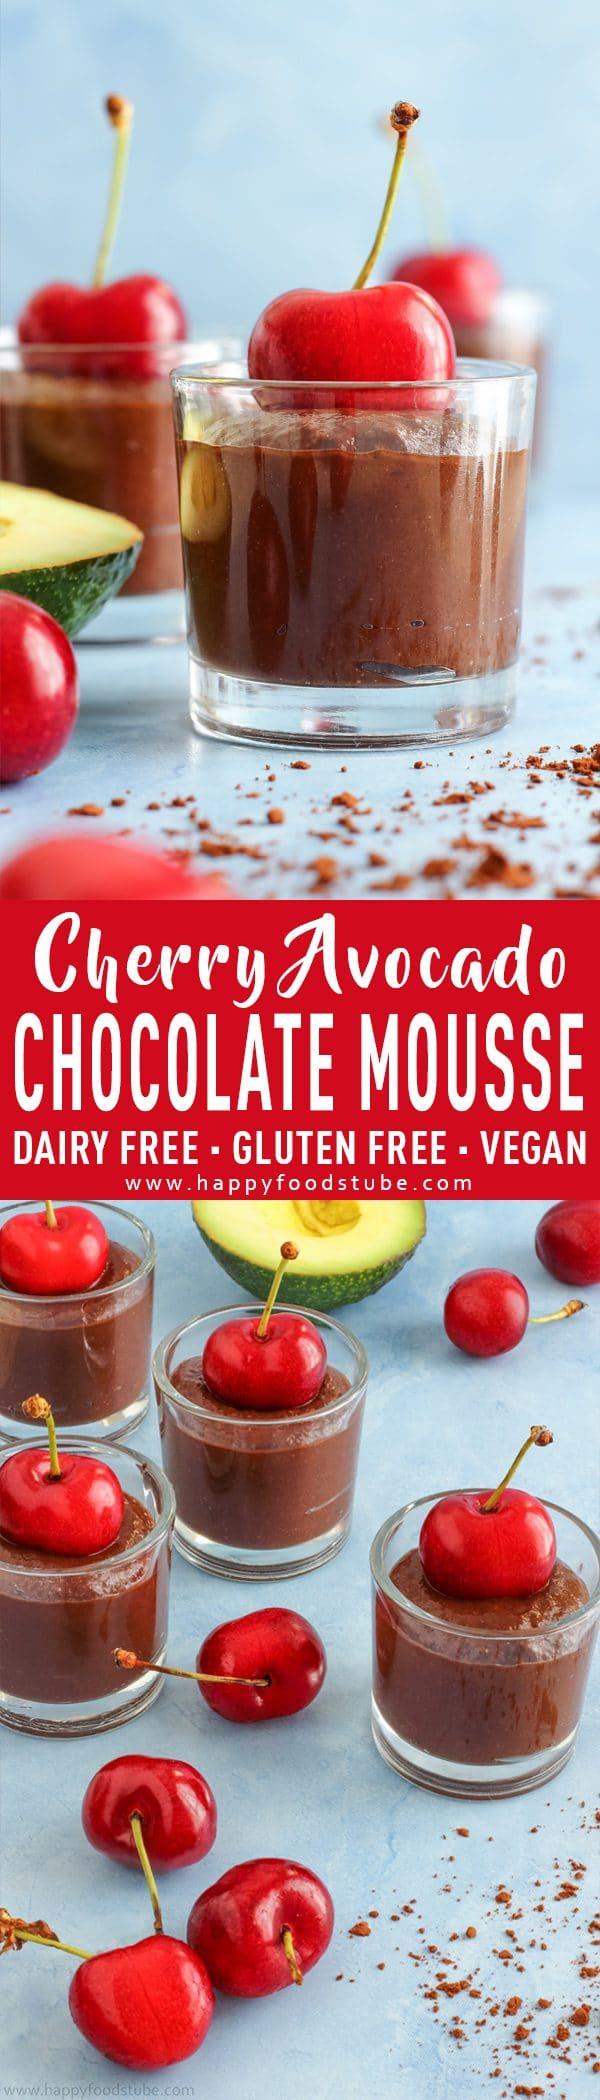 Cherry Avocado Chocolate Mousse Recipe Picture